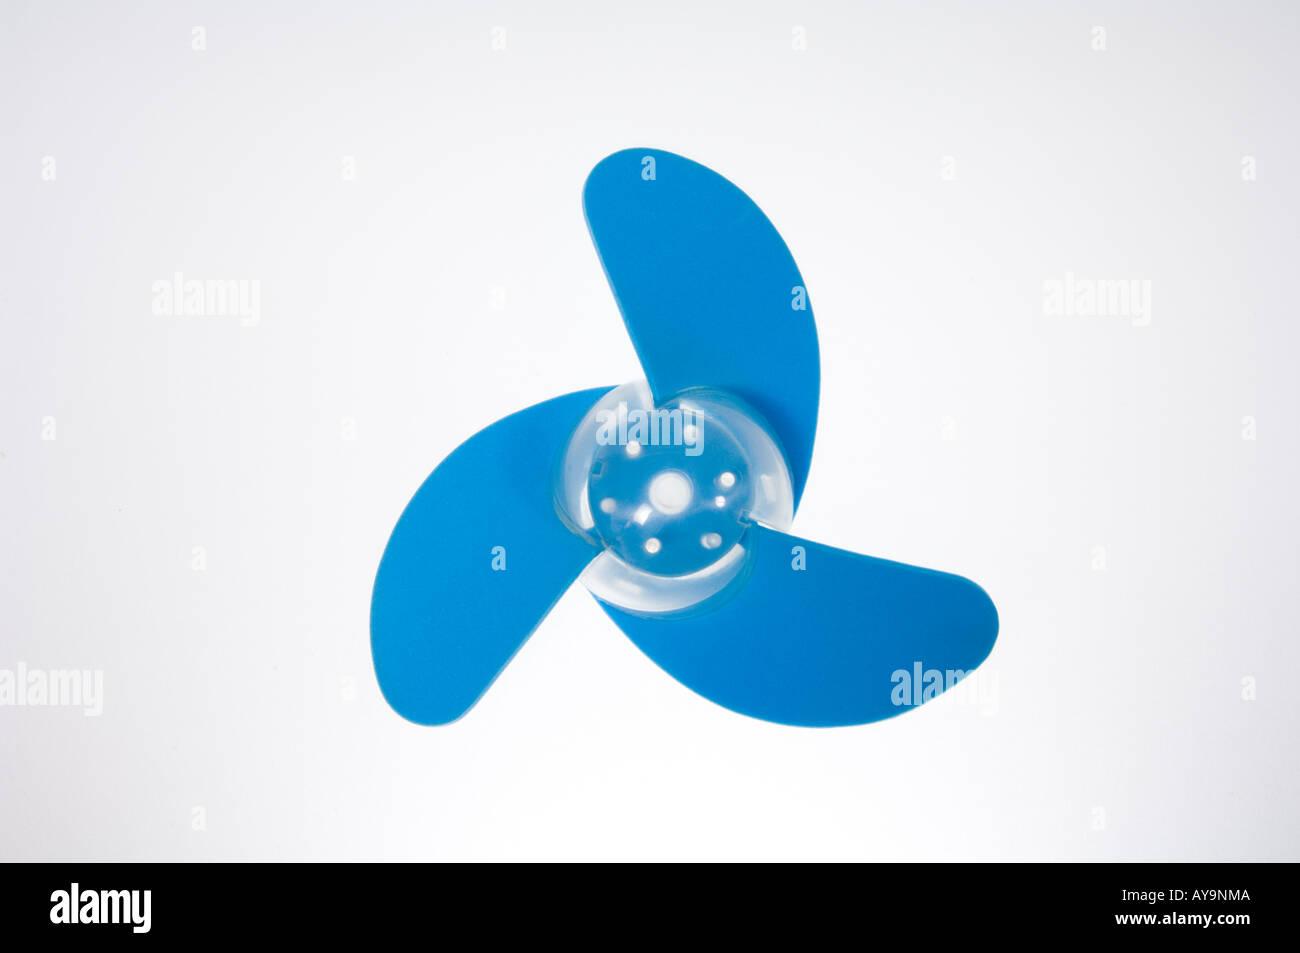 A blue propeller from a small desktop fan - Stock Image